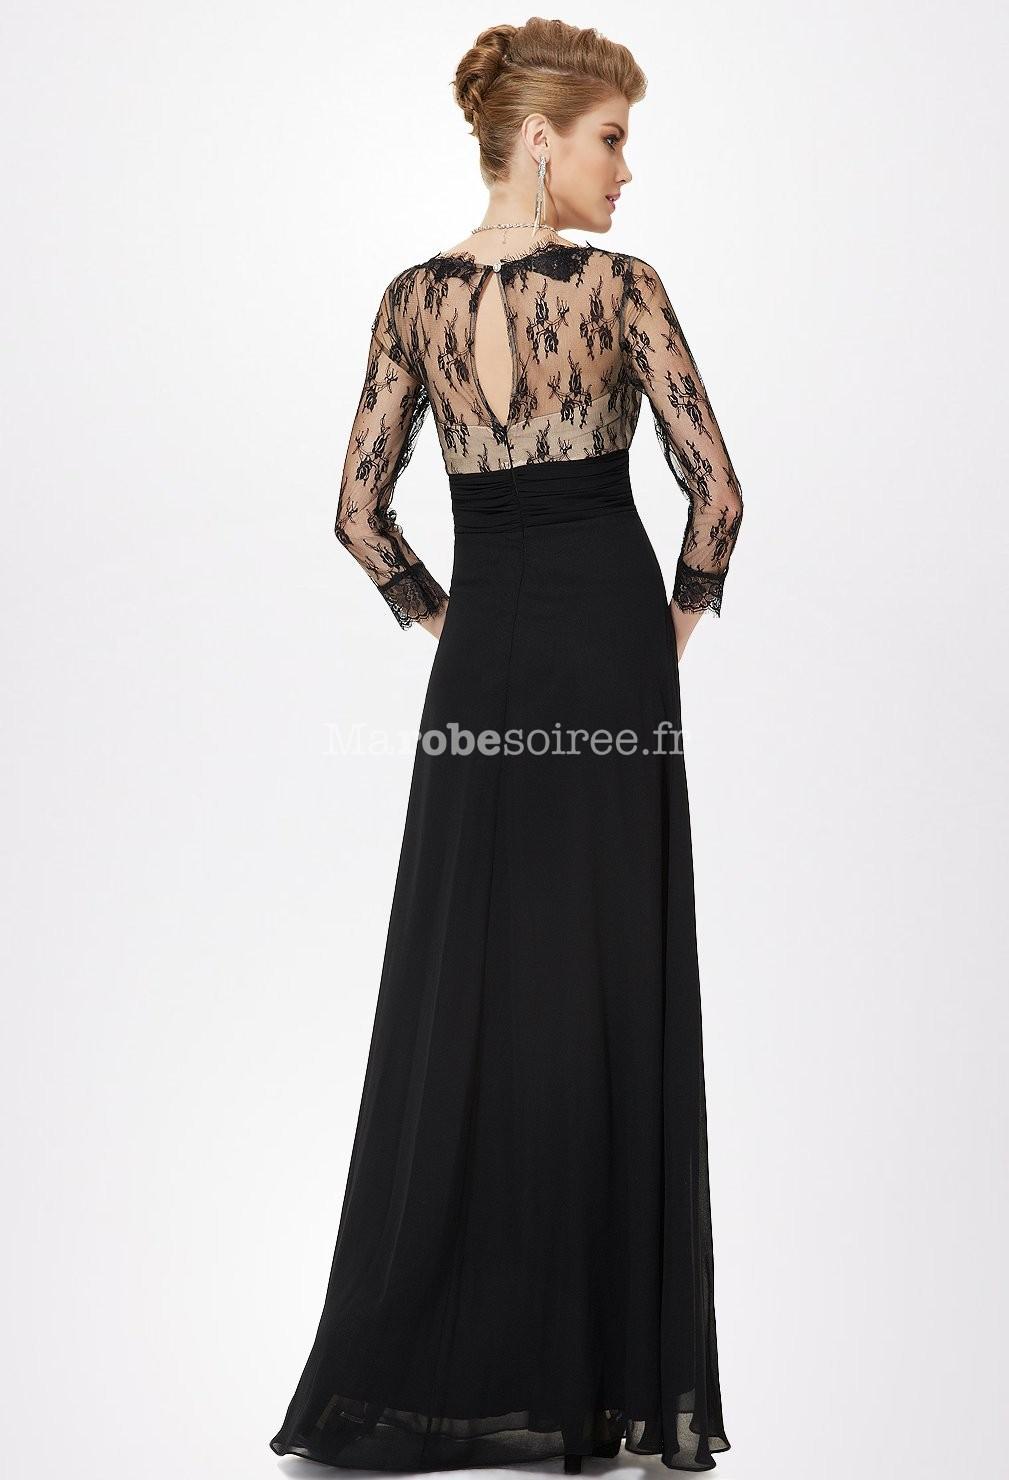 robes tonnantes blog robe longue dentelle noire transparente. Black Bedroom Furniture Sets. Home Design Ideas